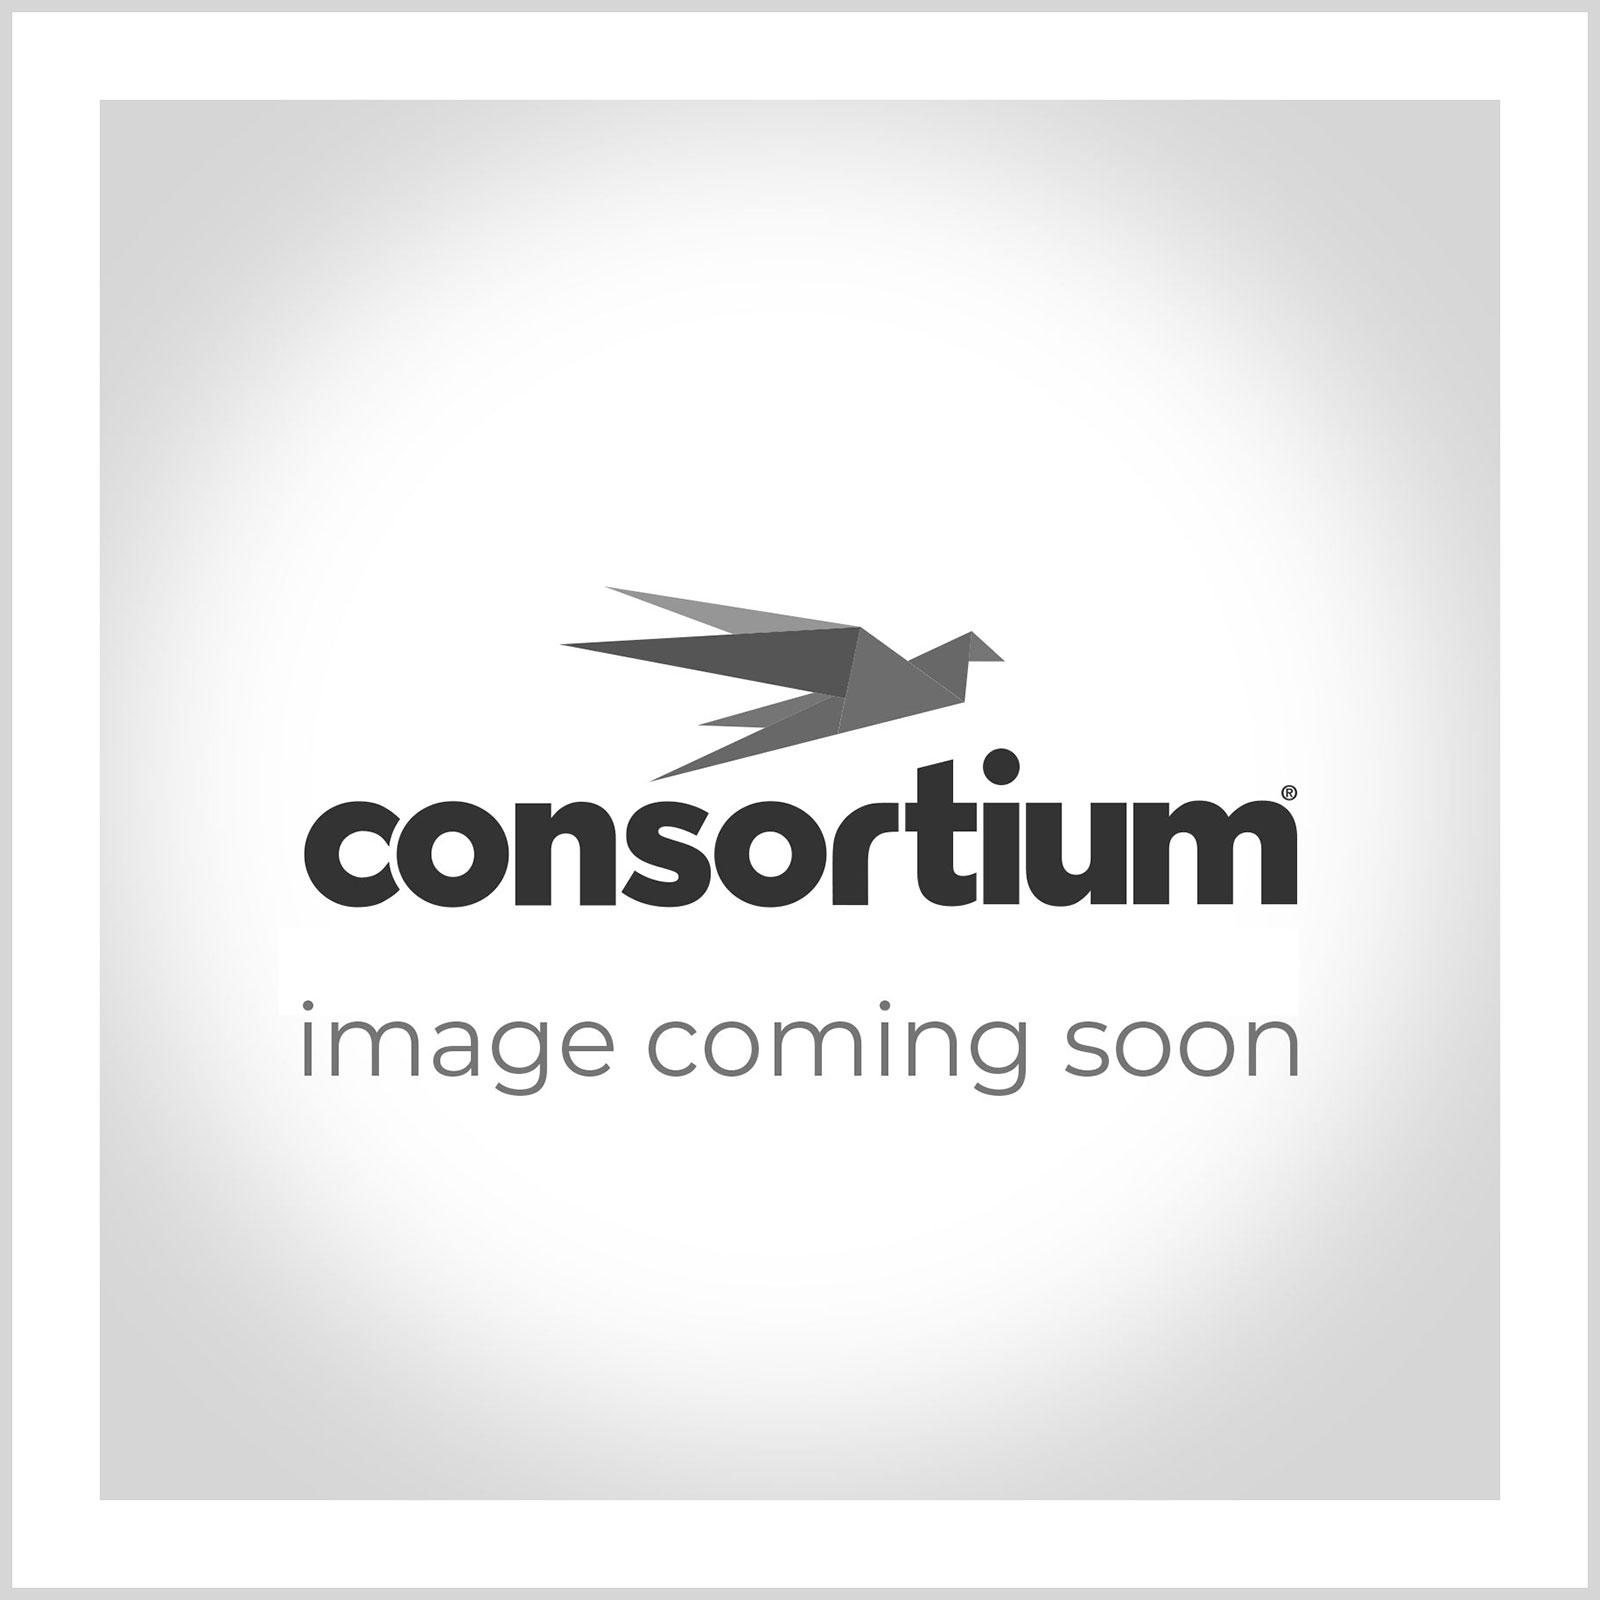 Pebble Patterned Polycarbonate Tableware